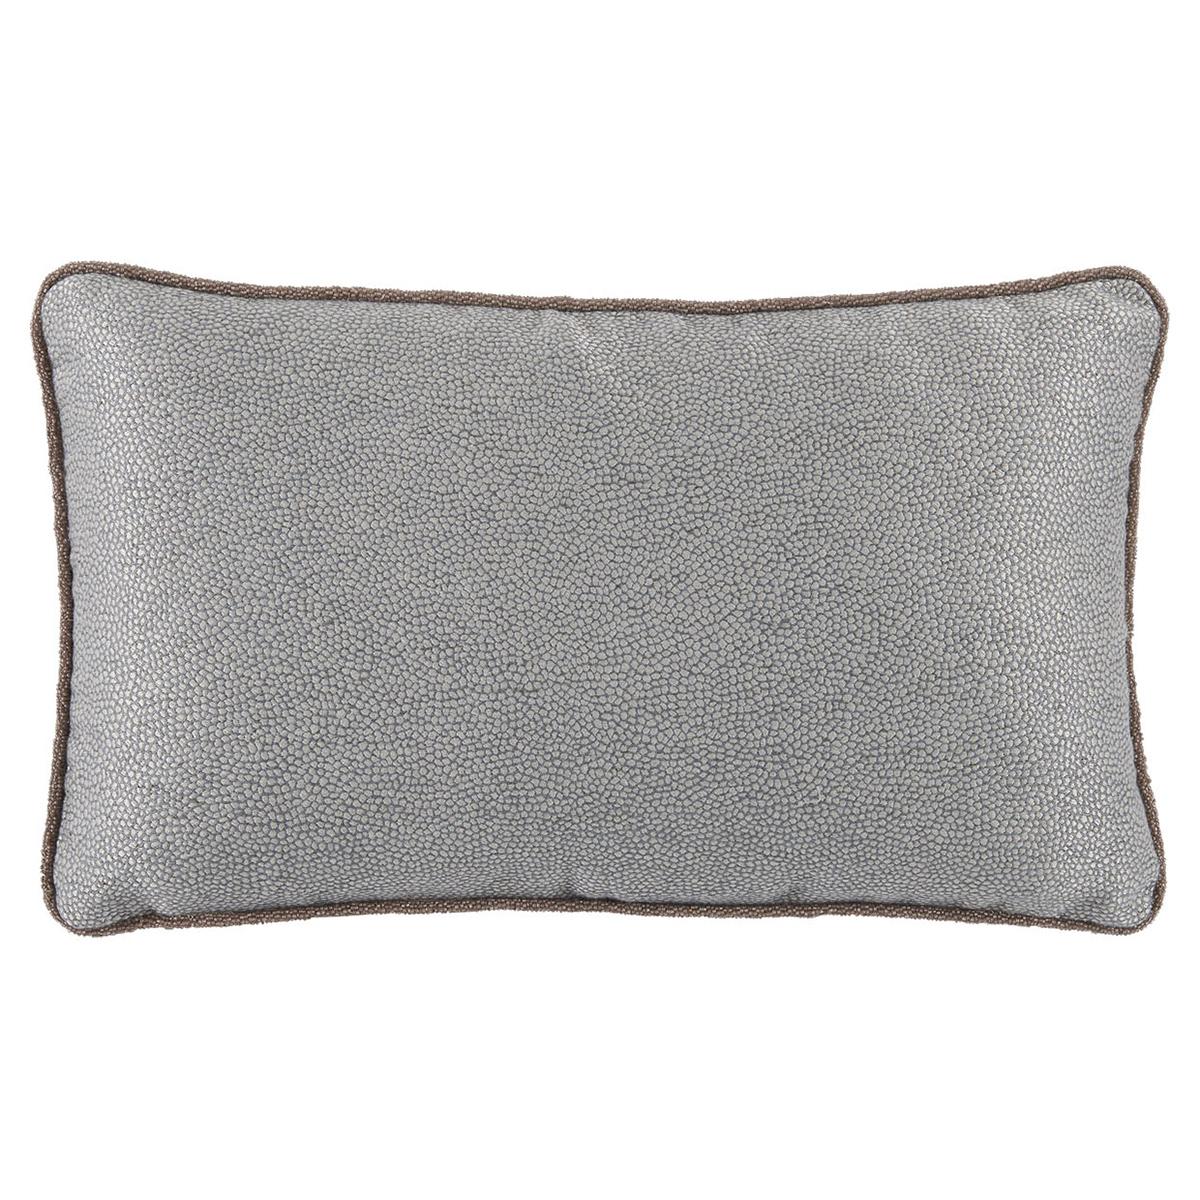 Felix Regency Beaded Cord Fog Blue Shagreen Pillow - 13x22